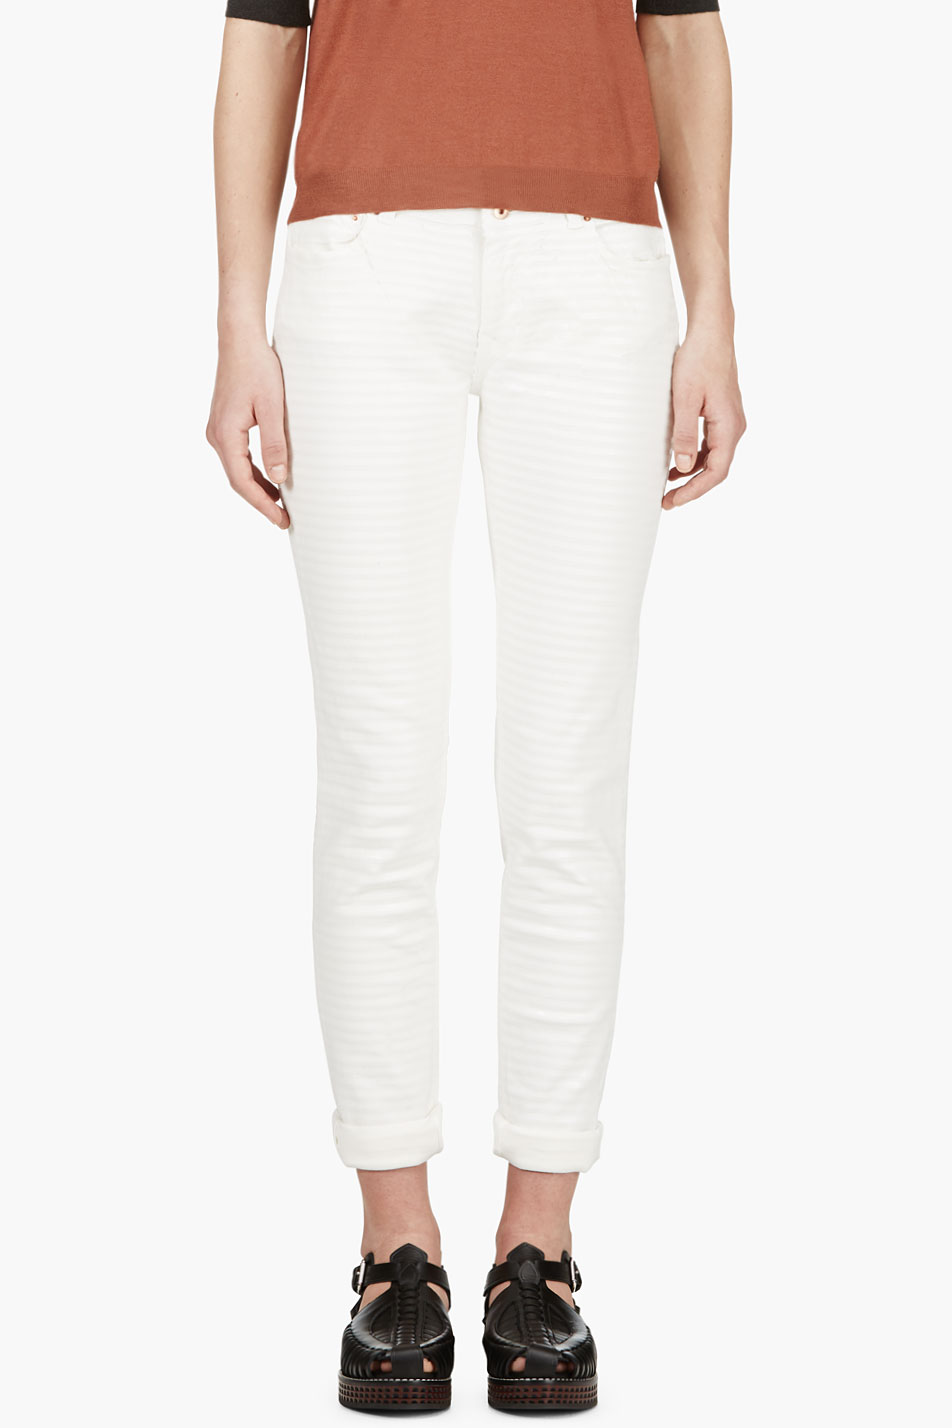 avelon ivory painted stripe neon jeans